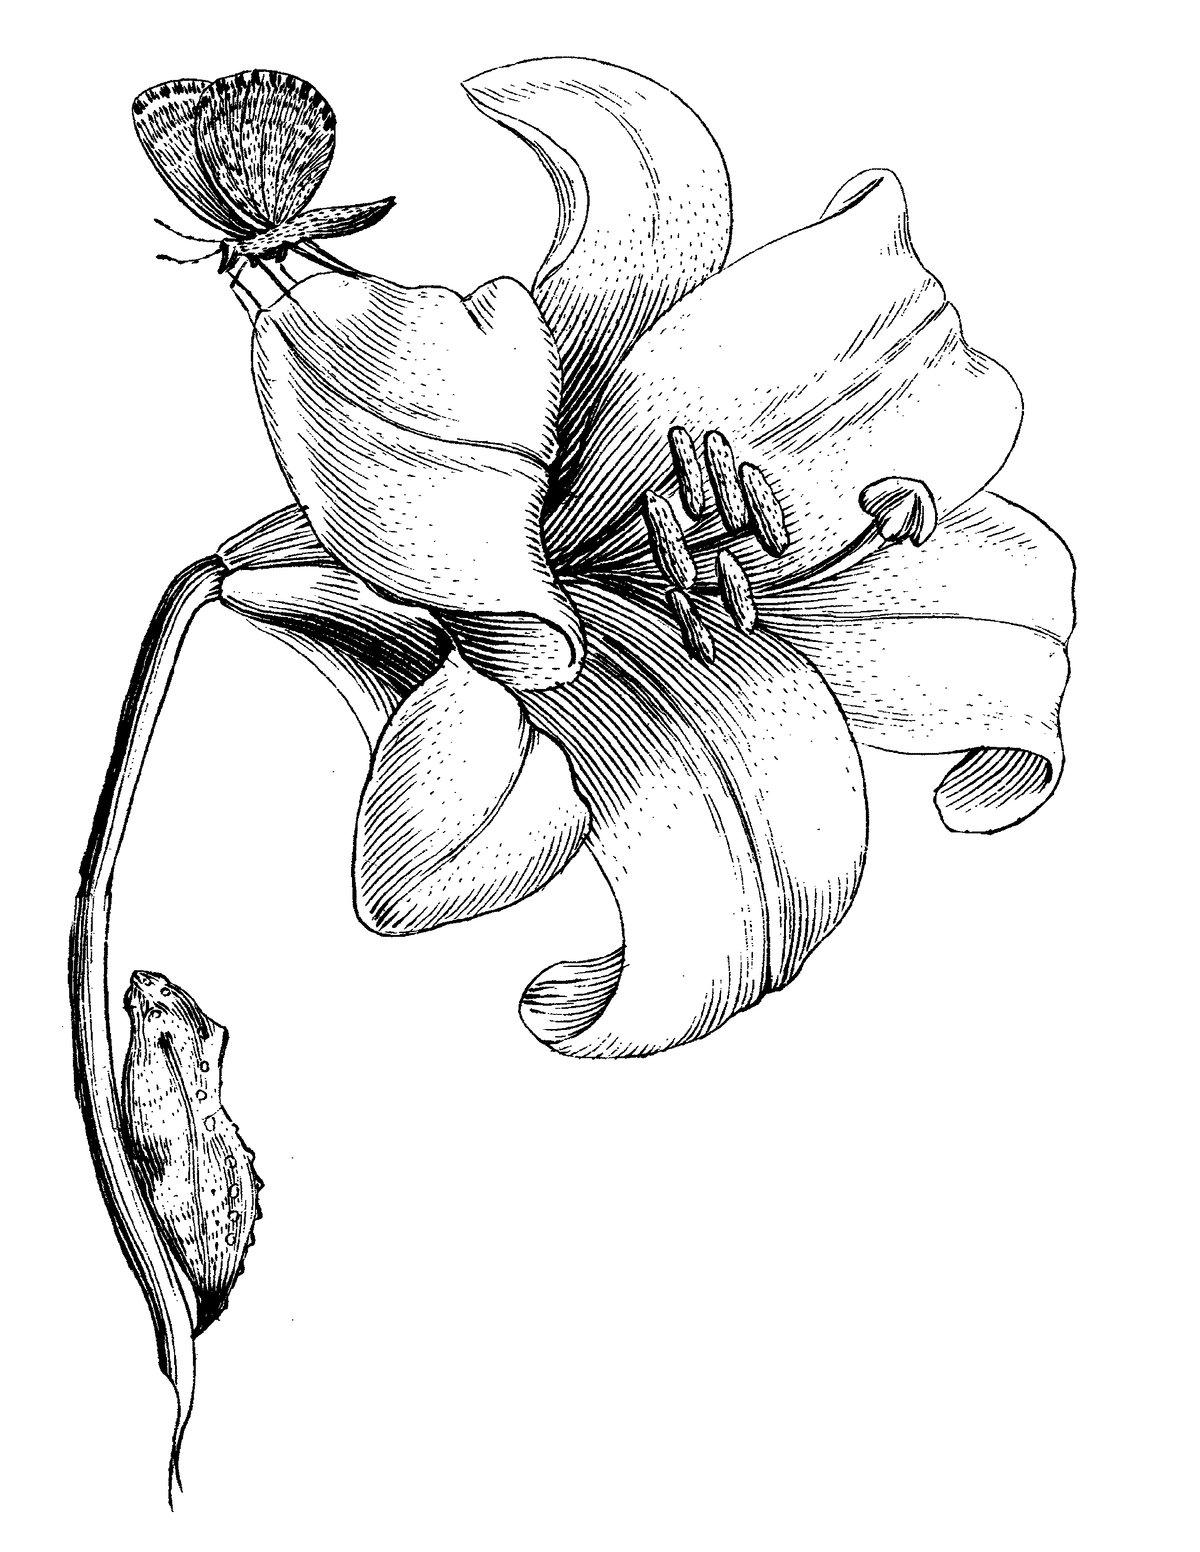 Image of CUSTOM PORTRAIT FOR CMAC